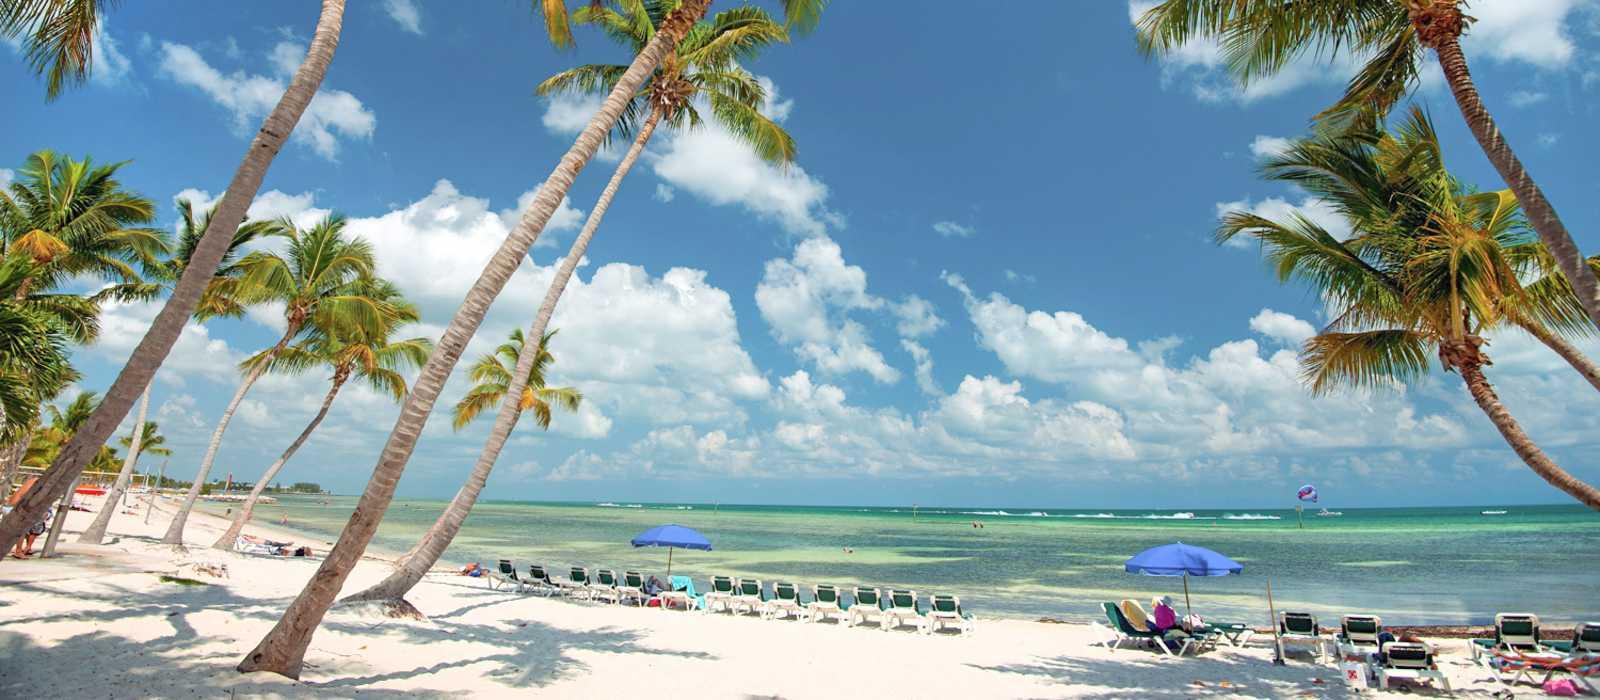 Blick auf den Smathers Beach in Key West, Florida